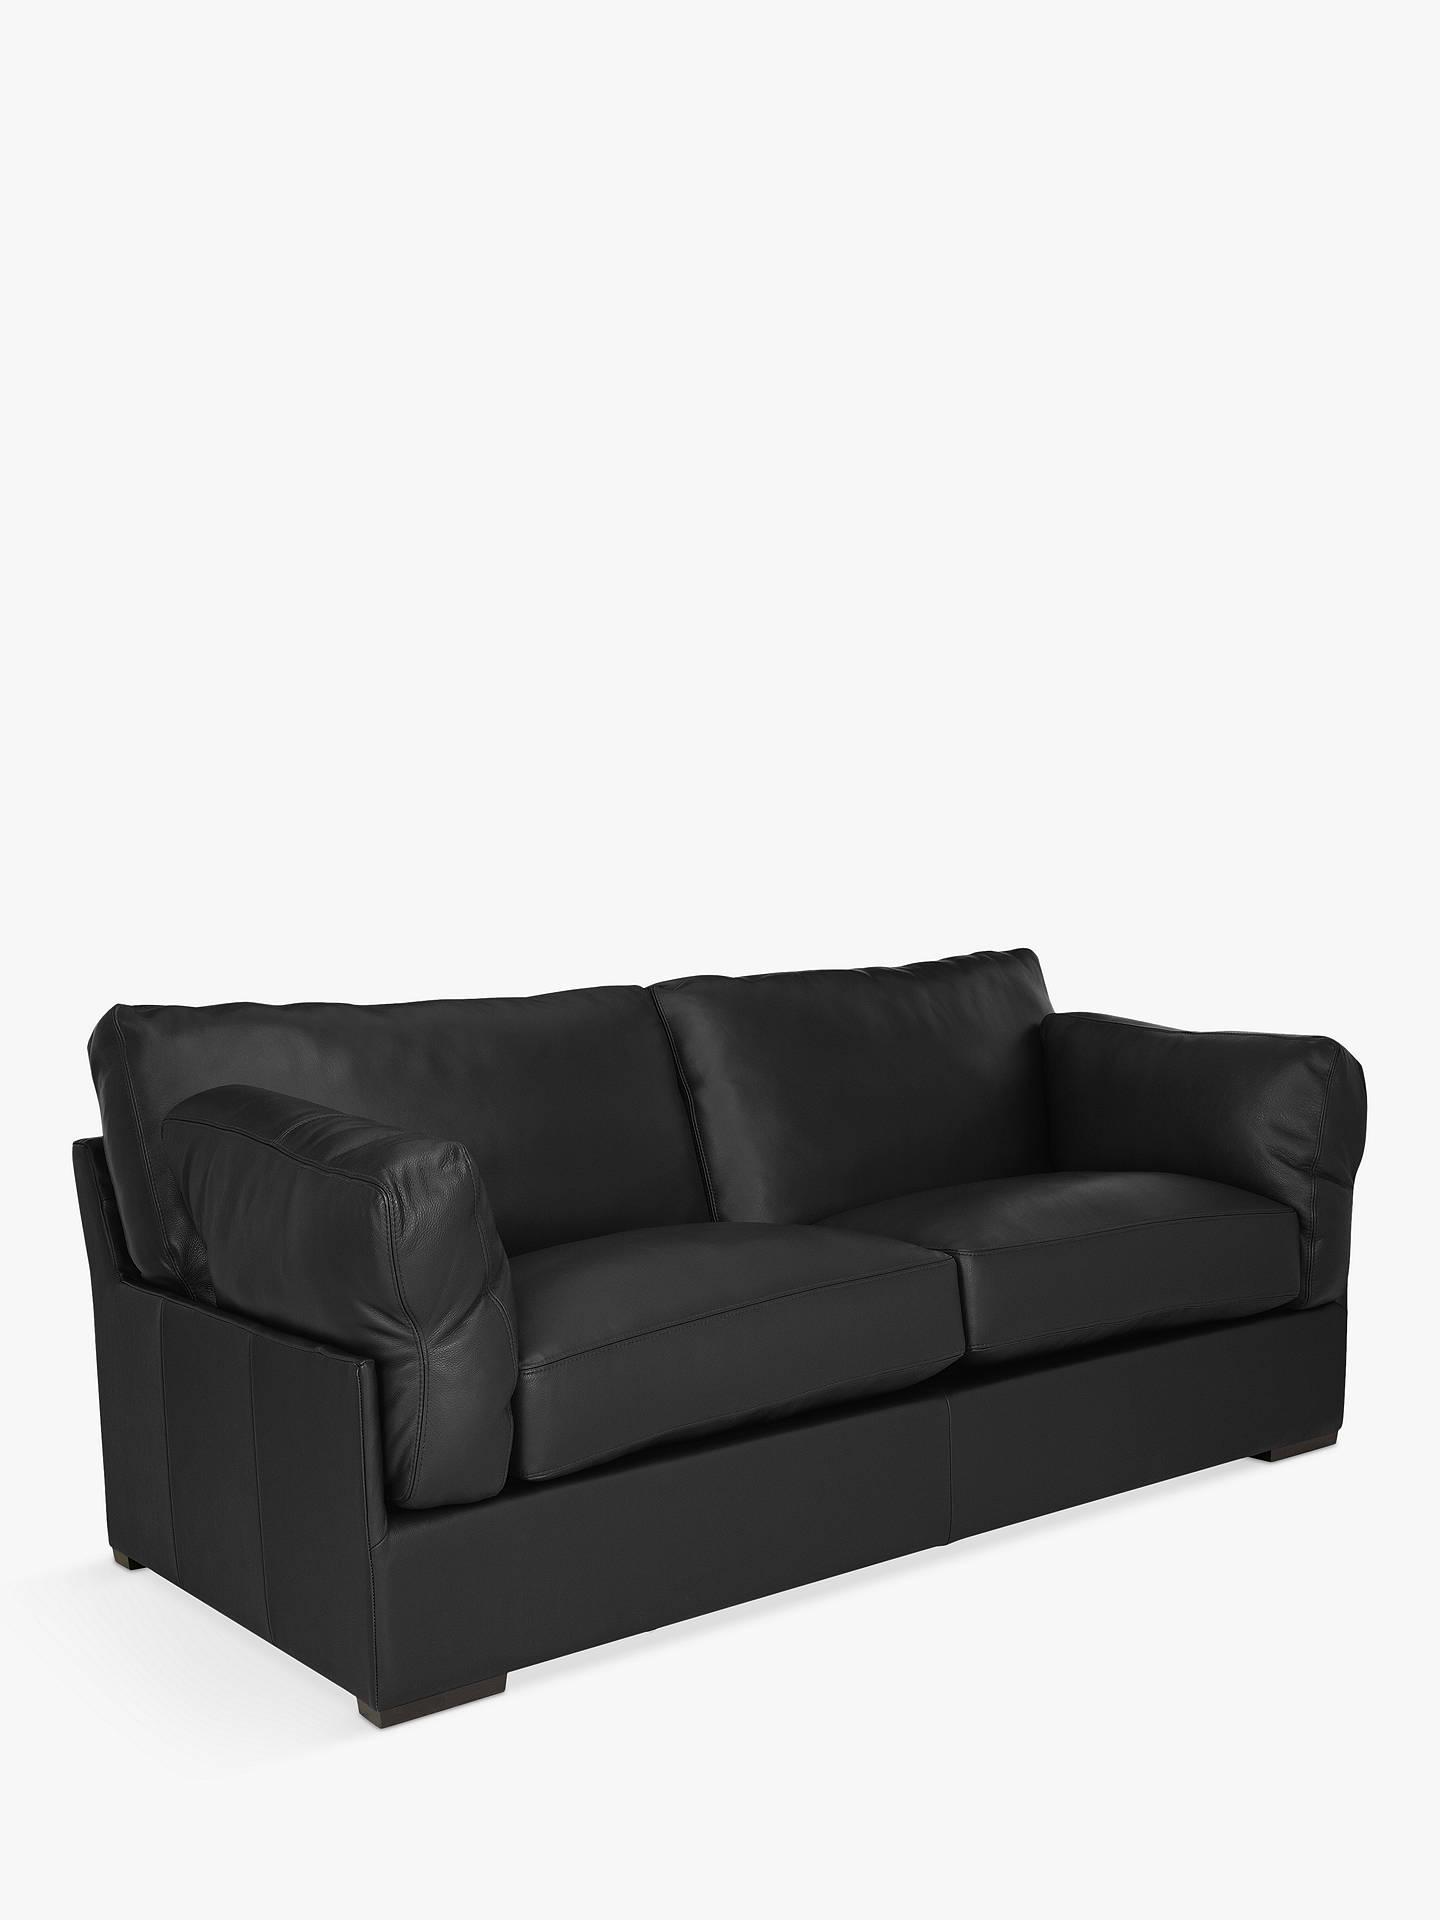 Awesome John Lewis Partners Java Medium 2 Seater Leather Sofa Cjindustries Chair Design For Home Cjindustriesco